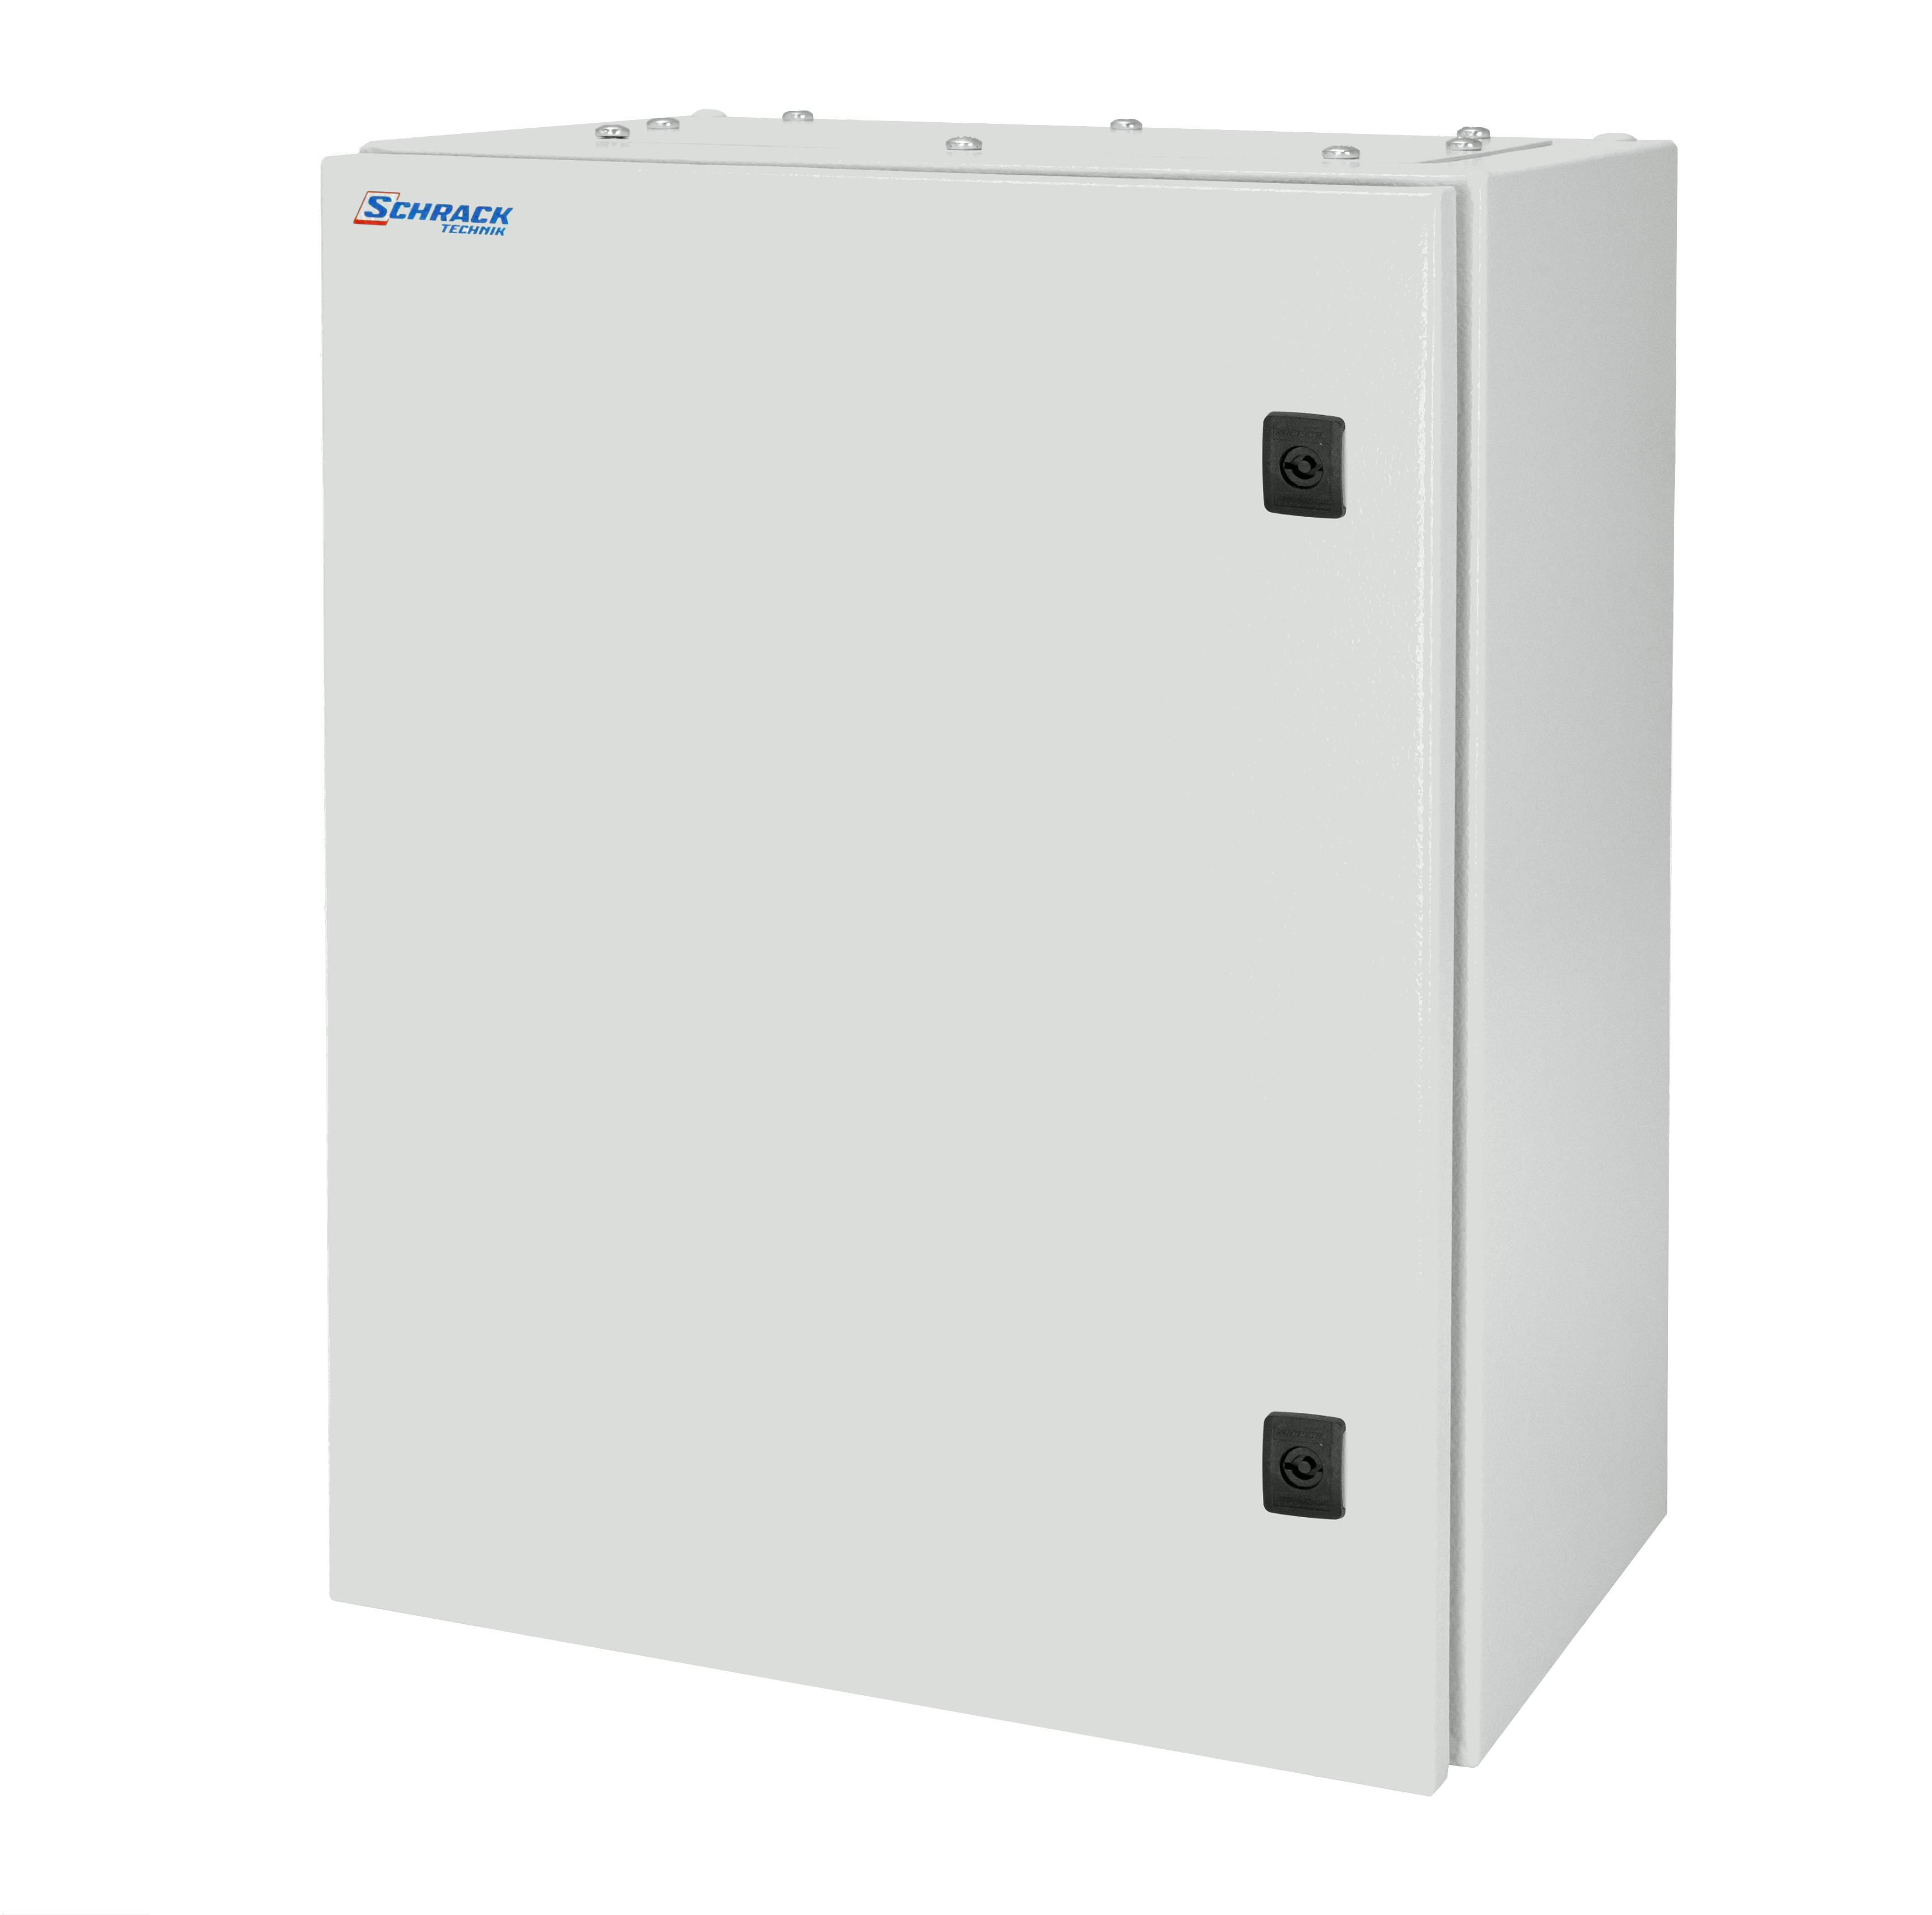 1 Stk Wandschrank Mono IP66 H=600 B=500 T=155 Stahlblech WSM6050150